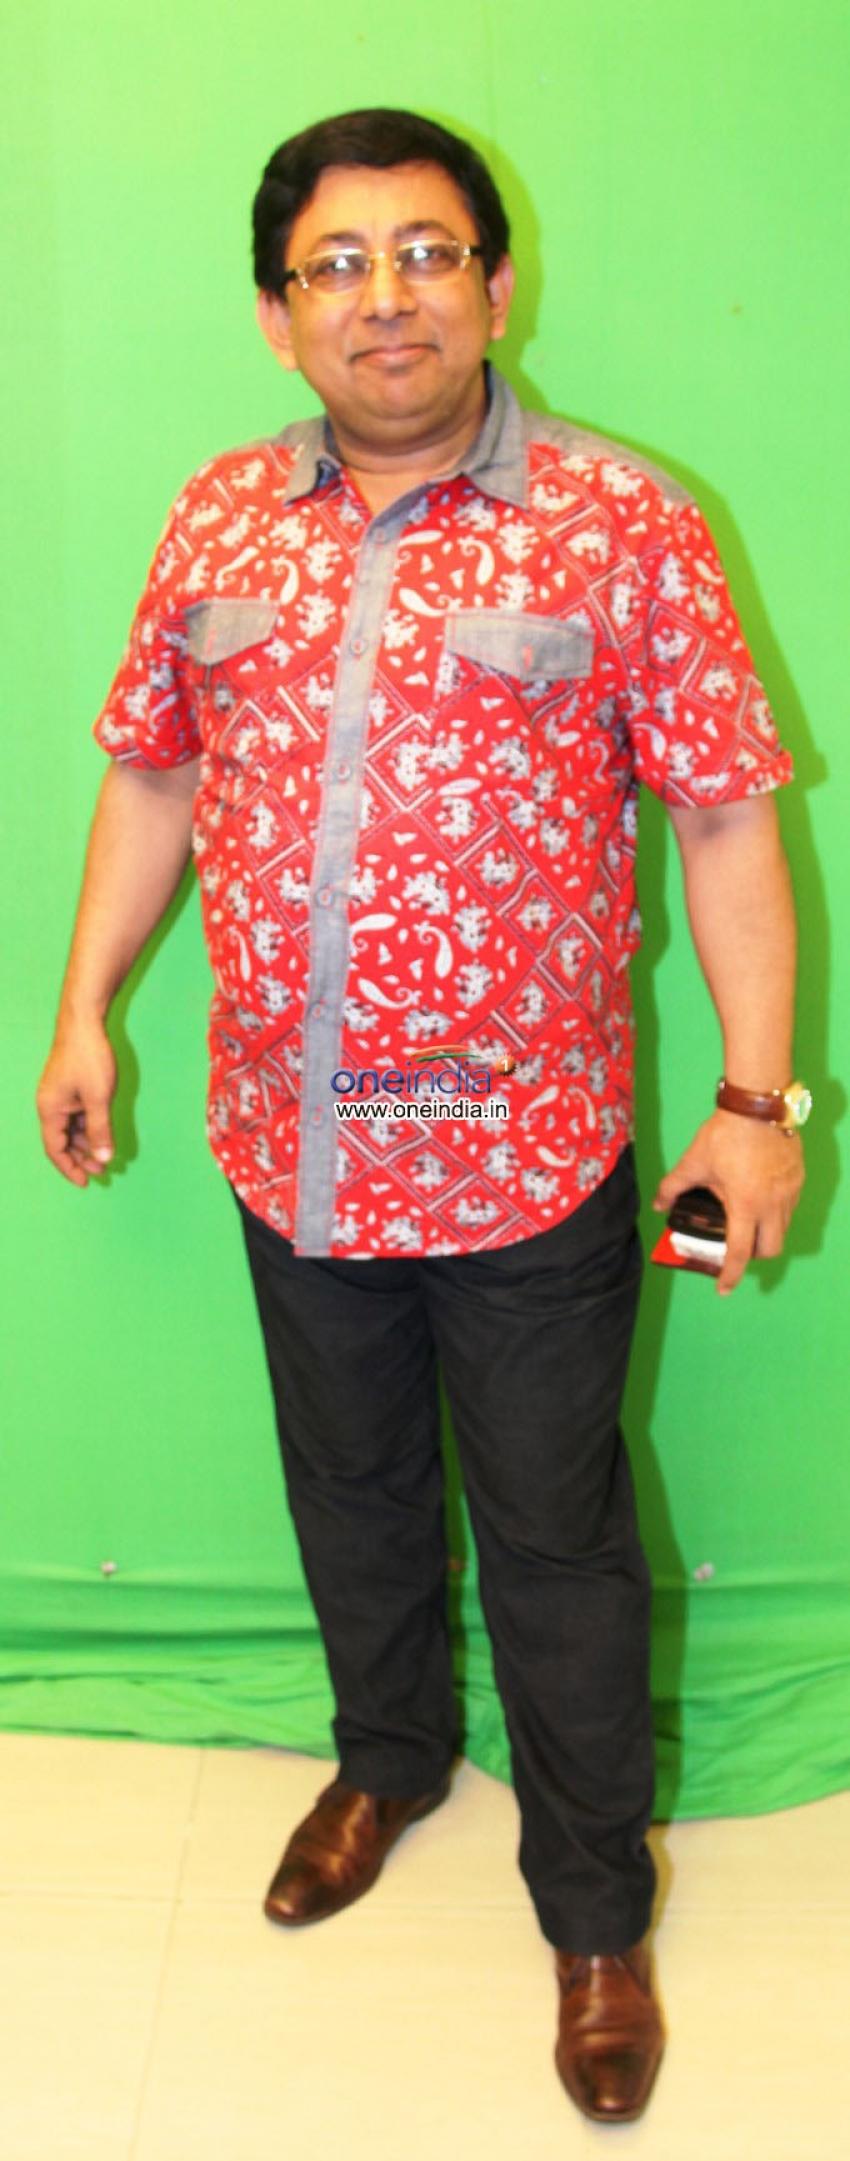 Baat Bann Gayi film photoshoot Photos